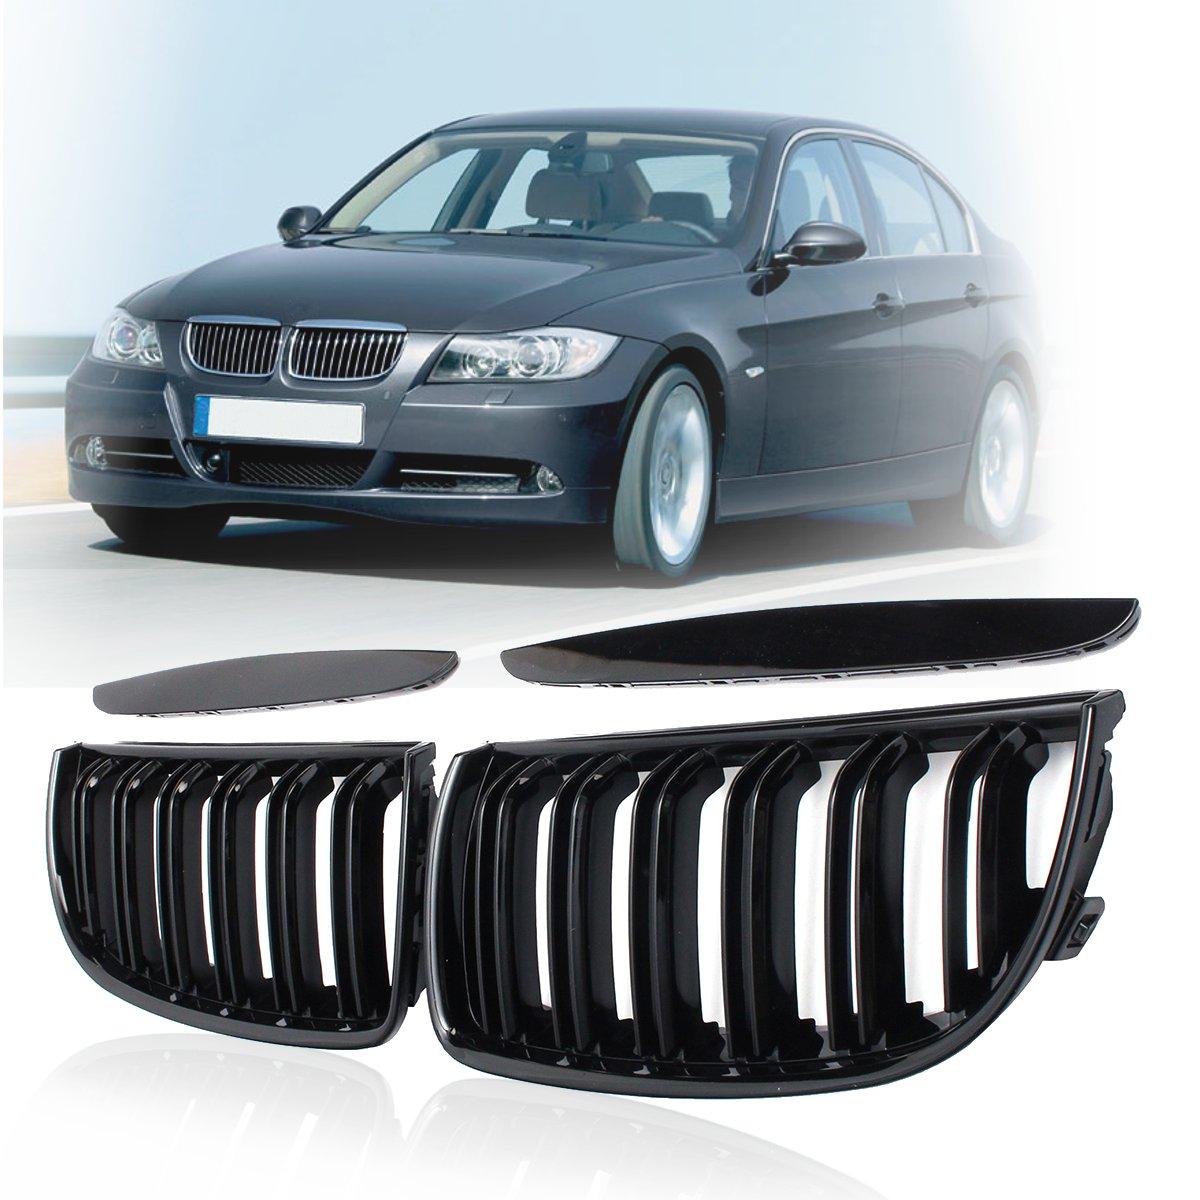 Par de 4 colores frente brillante mate carbón M Color negro 2 líneas doble listón Parrilla de riñón para BMW E90 E91 4 puertas 2005 06 07 2008